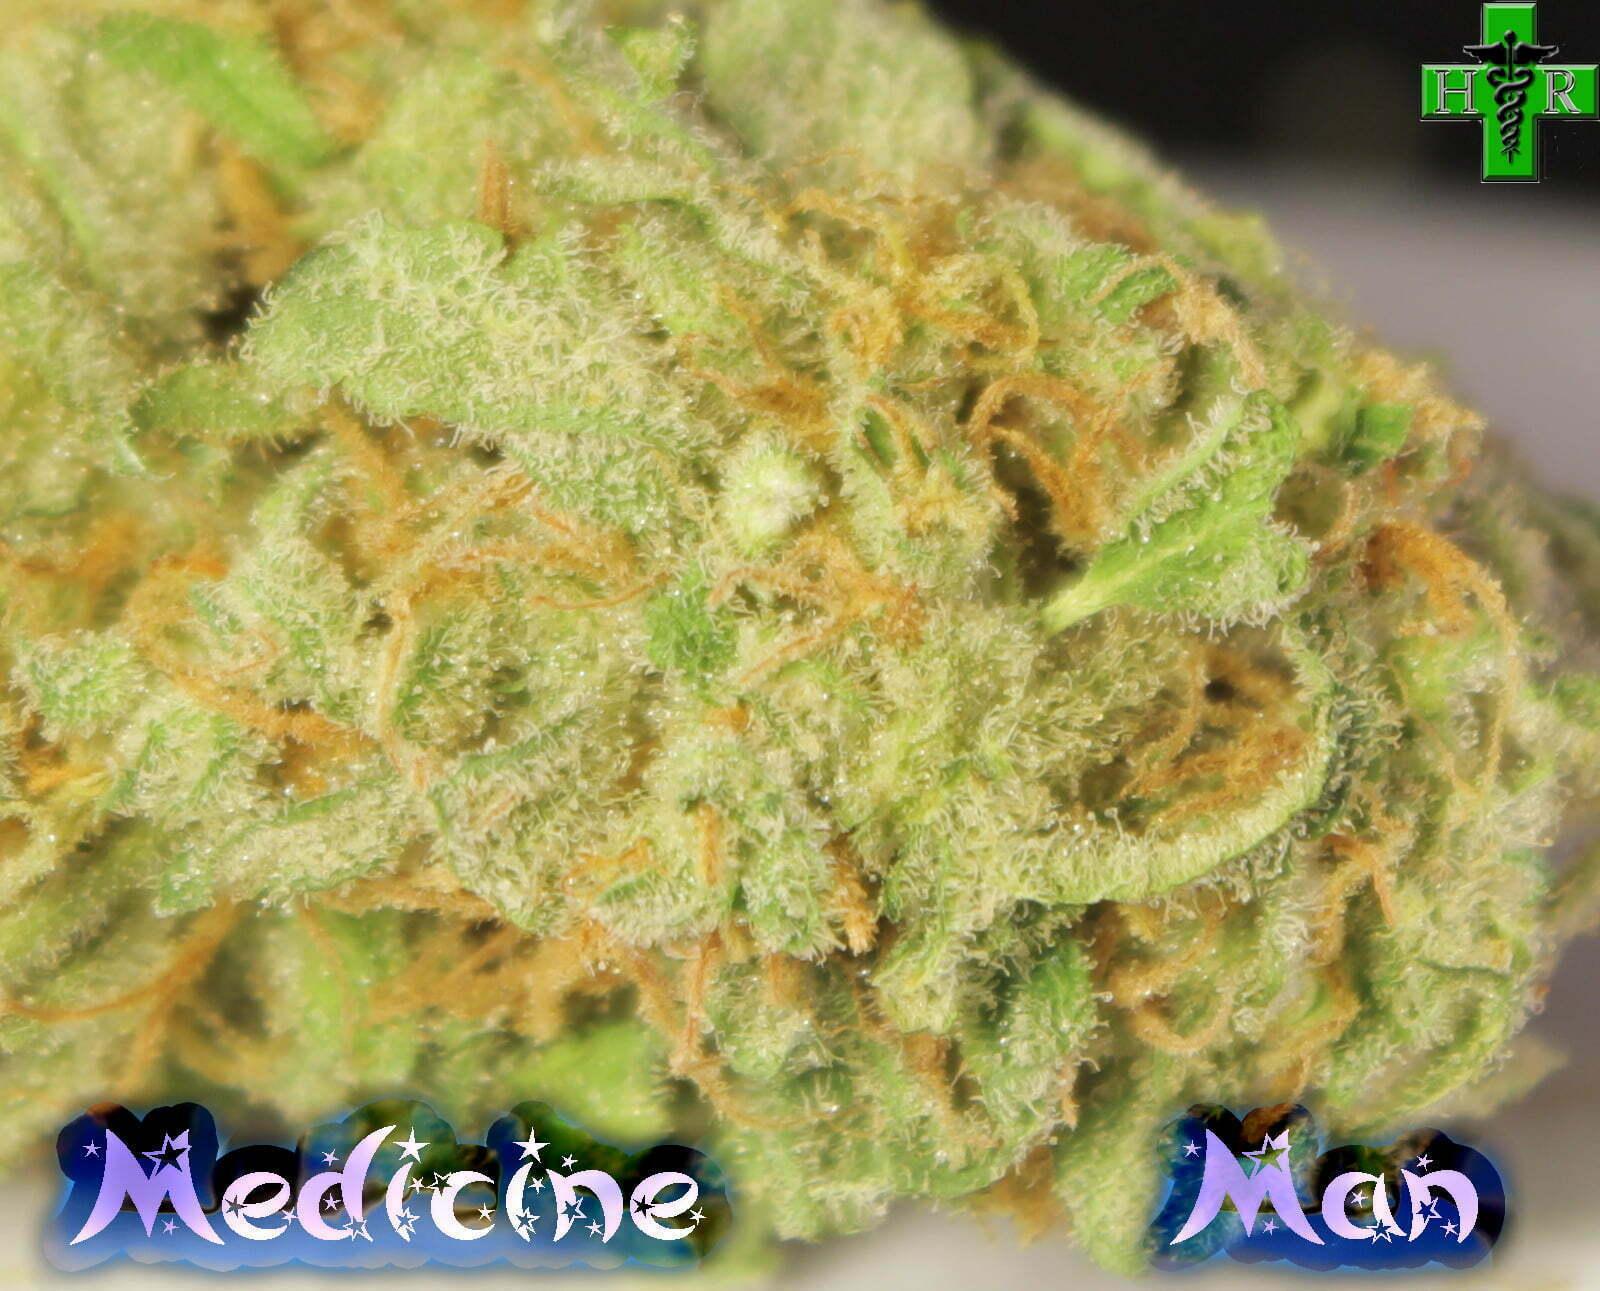 Medicine Man Strain Review - I Love Growing Marijuana